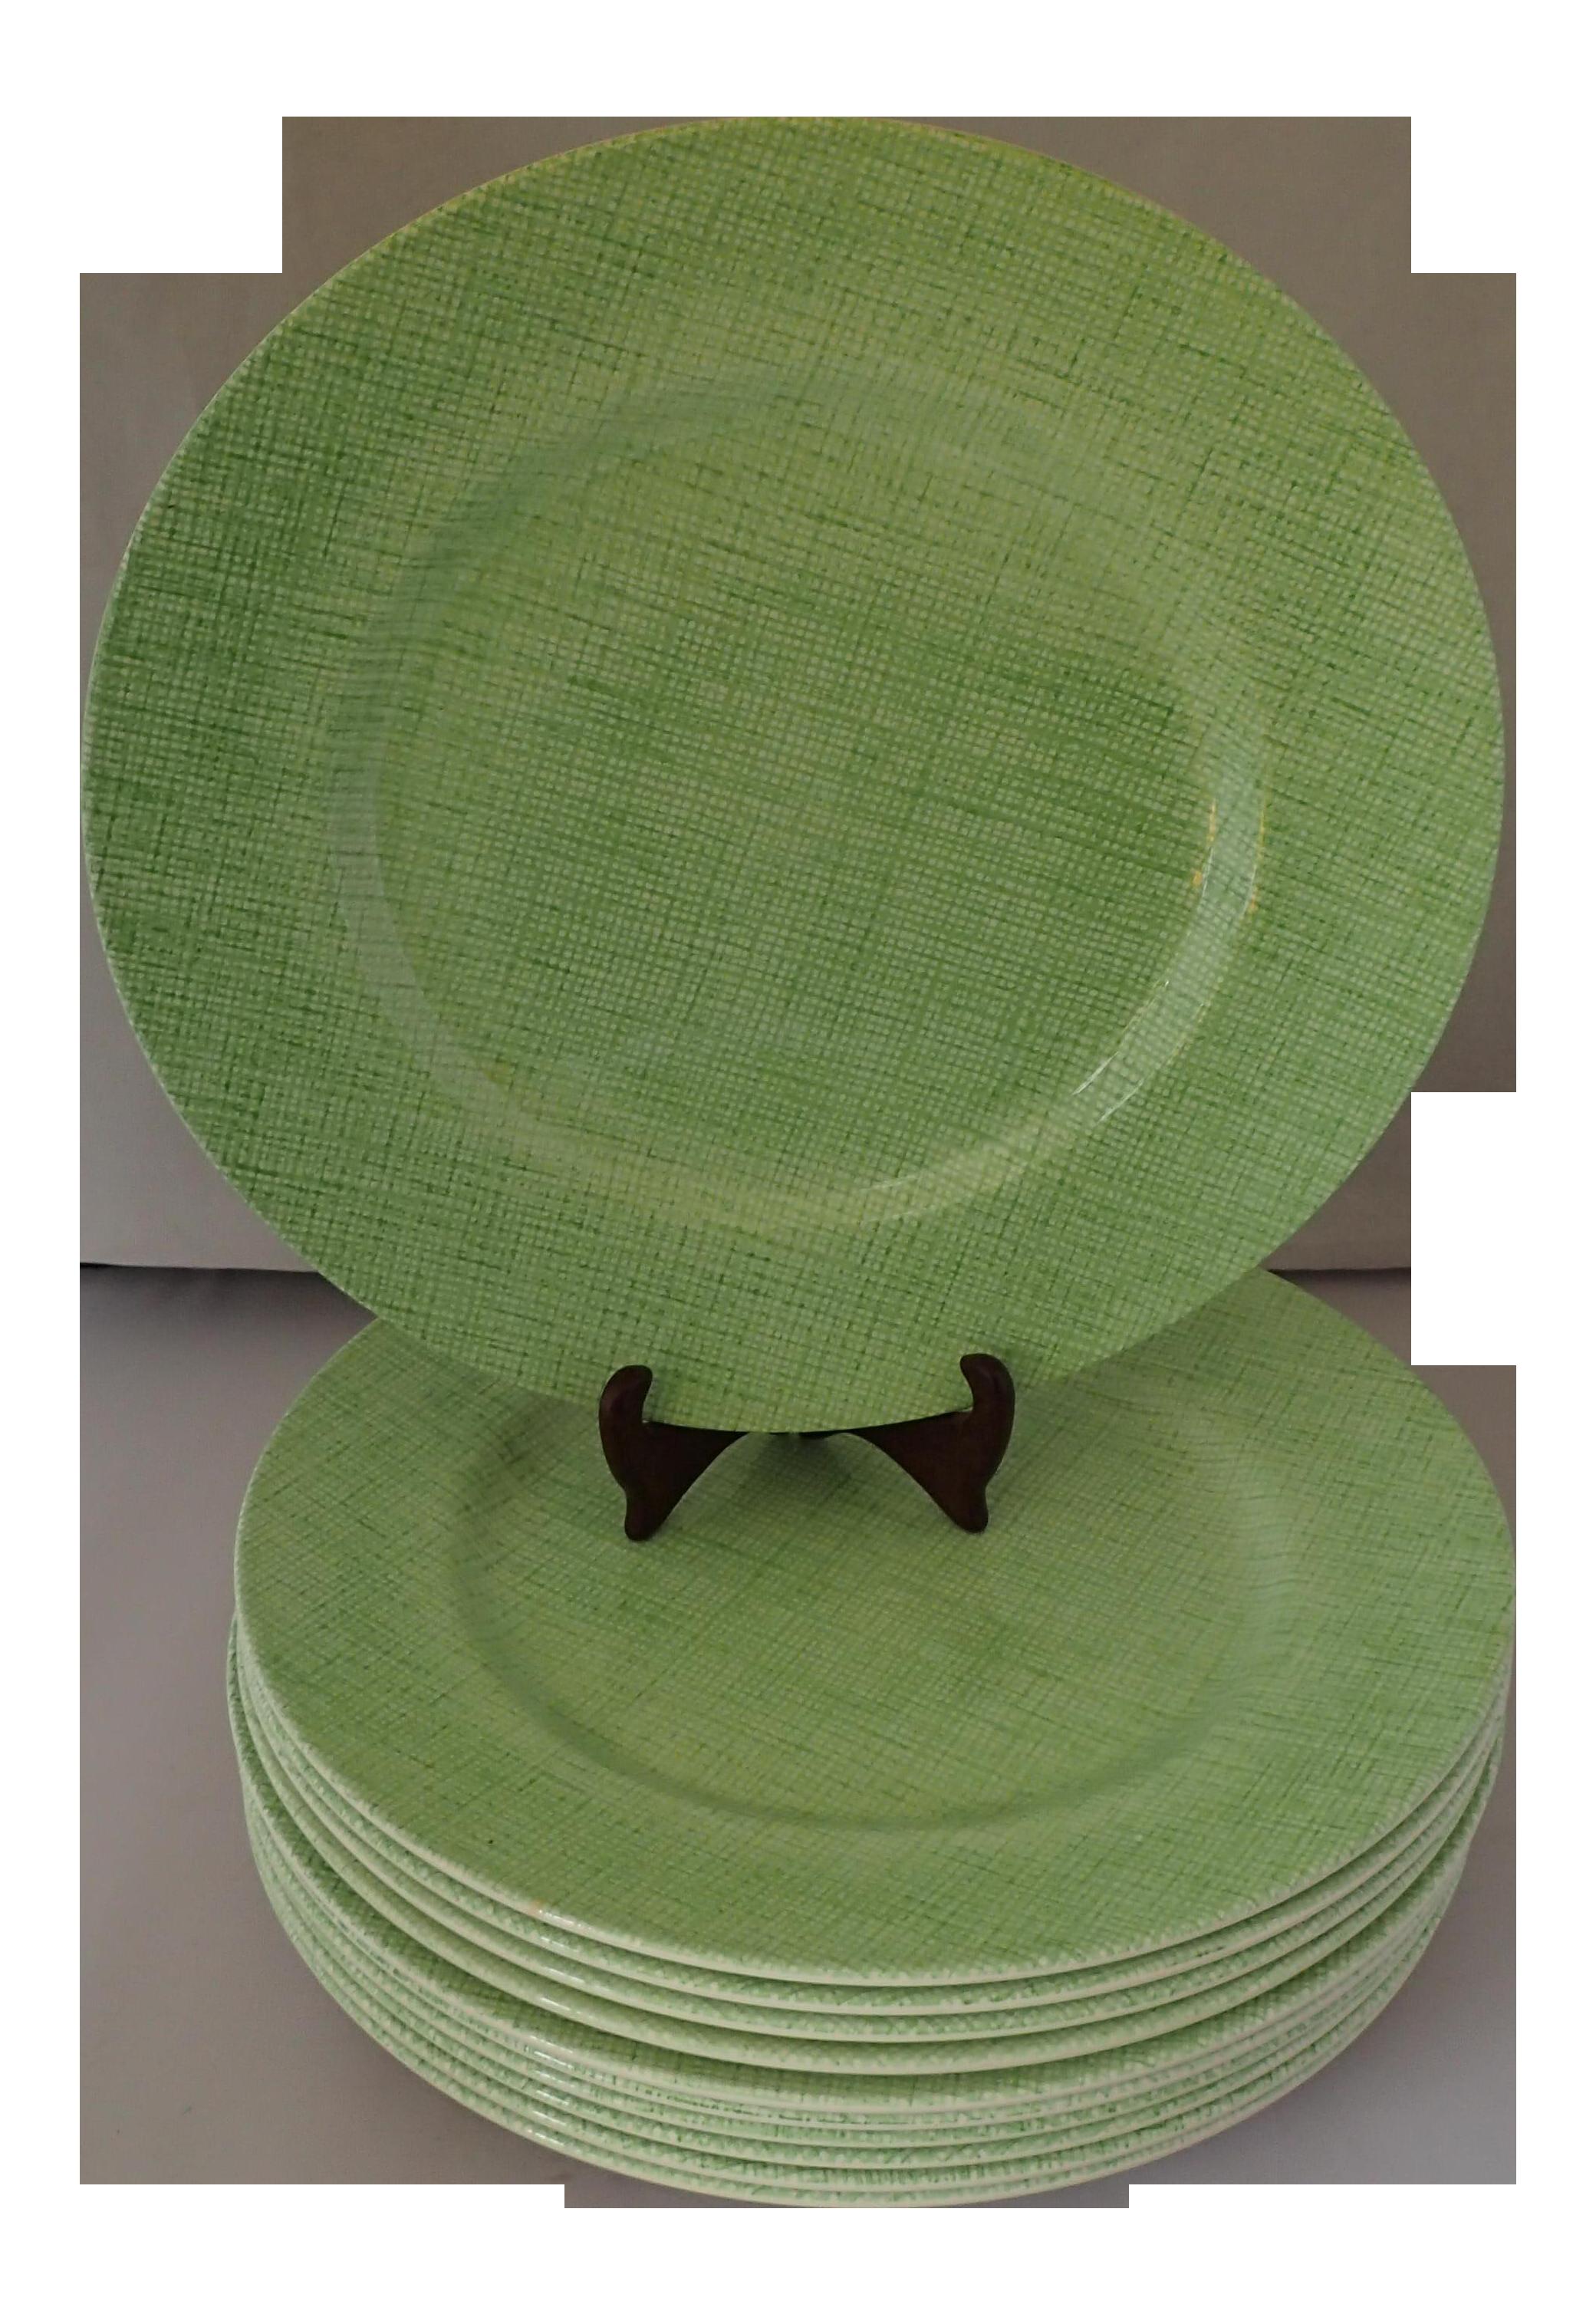 Royal Stafford Earthenware Green Dinner Plates - Set of 11  sc 1 st  Chairish & Royal Stafford Earthenware Green Dinner Plates - Set of 11   Chairish